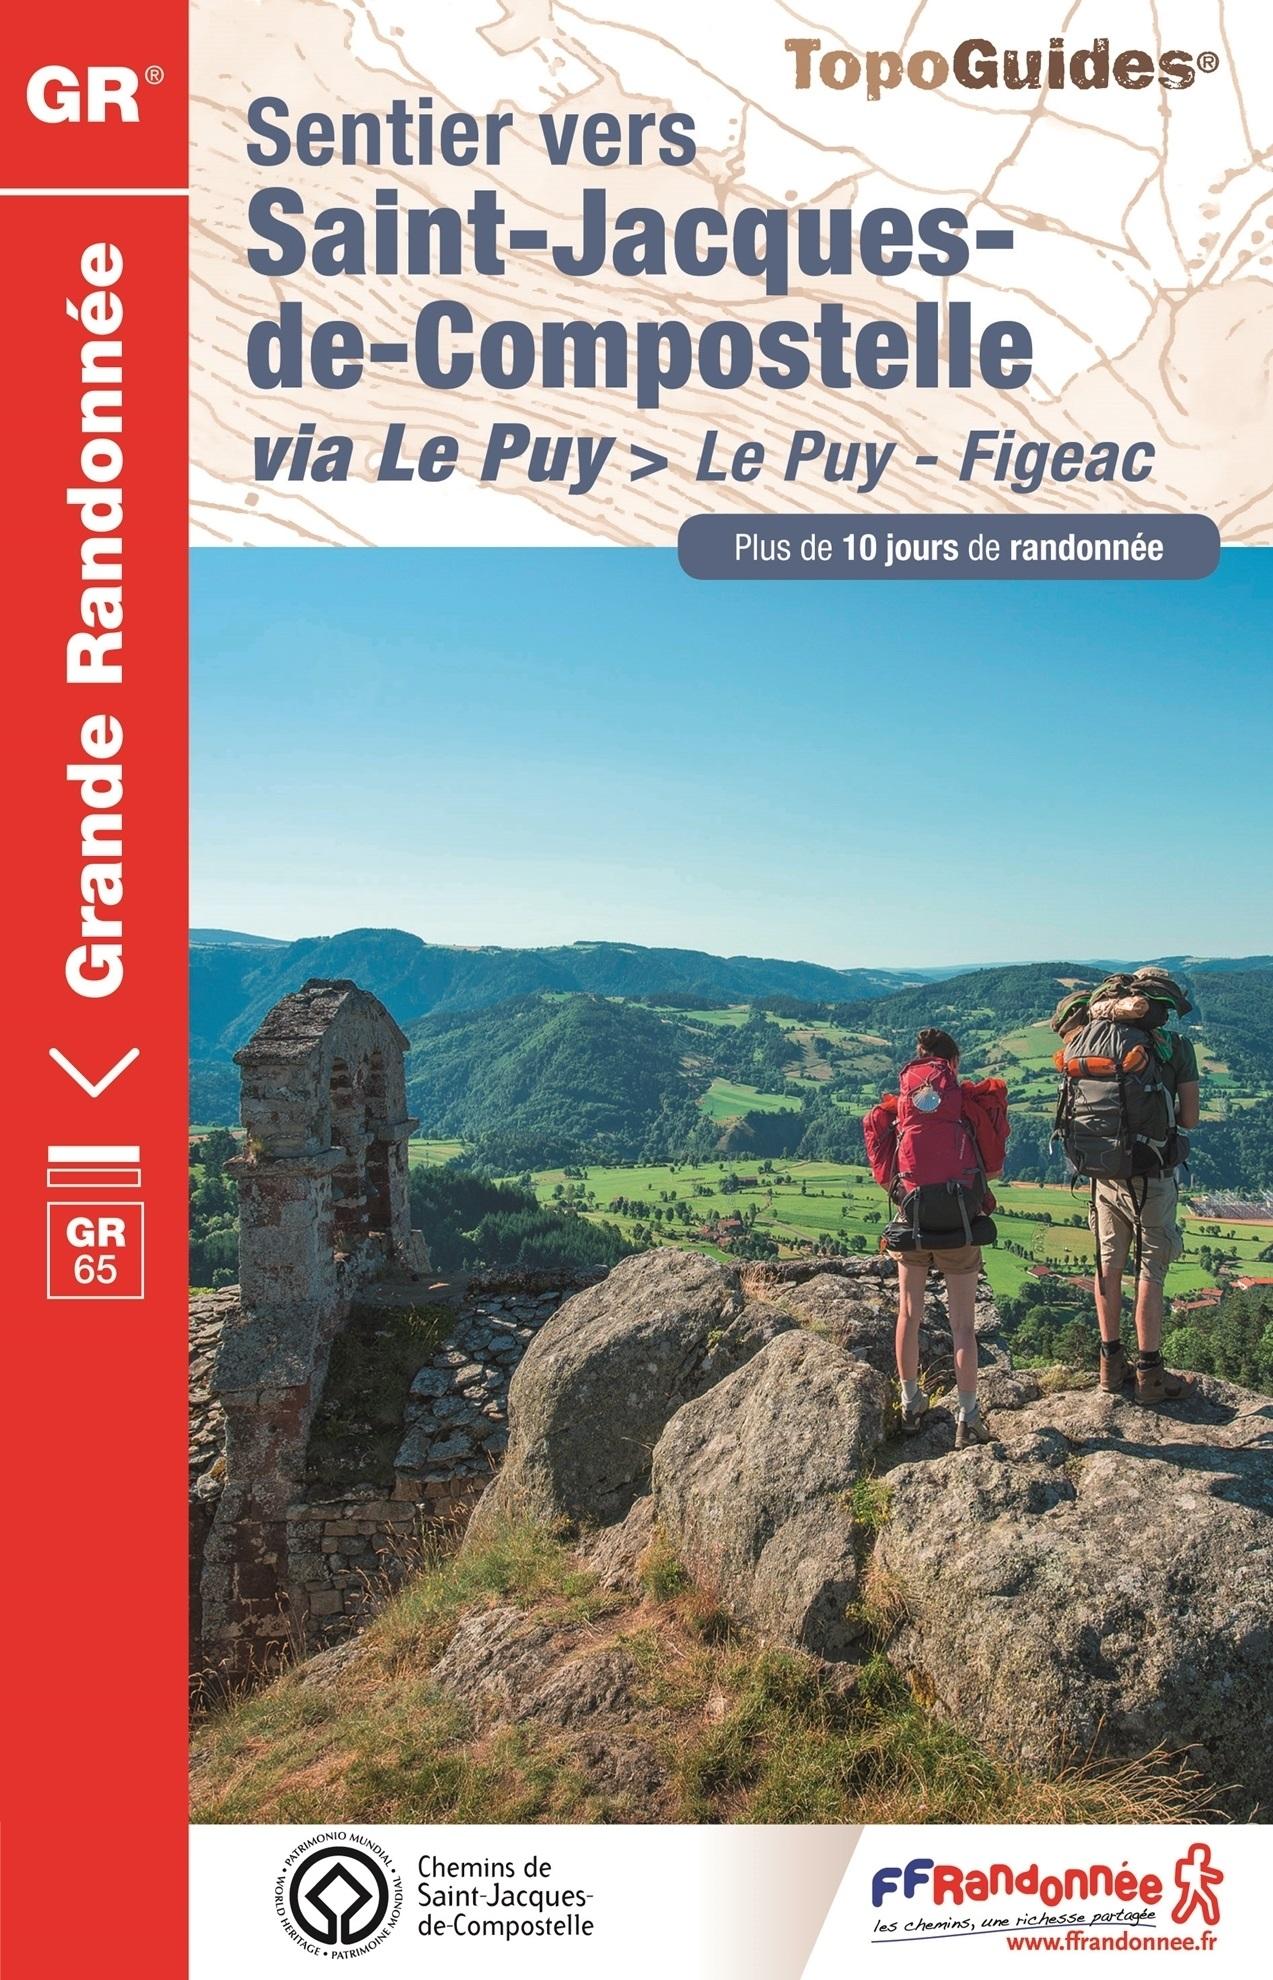 TG651  Sentier de Saint-Jacques I wandelgids GR-65 9782751409738  FFRP Topoguides  Santiago de Compostela, Wandelgidsen Frankrijk